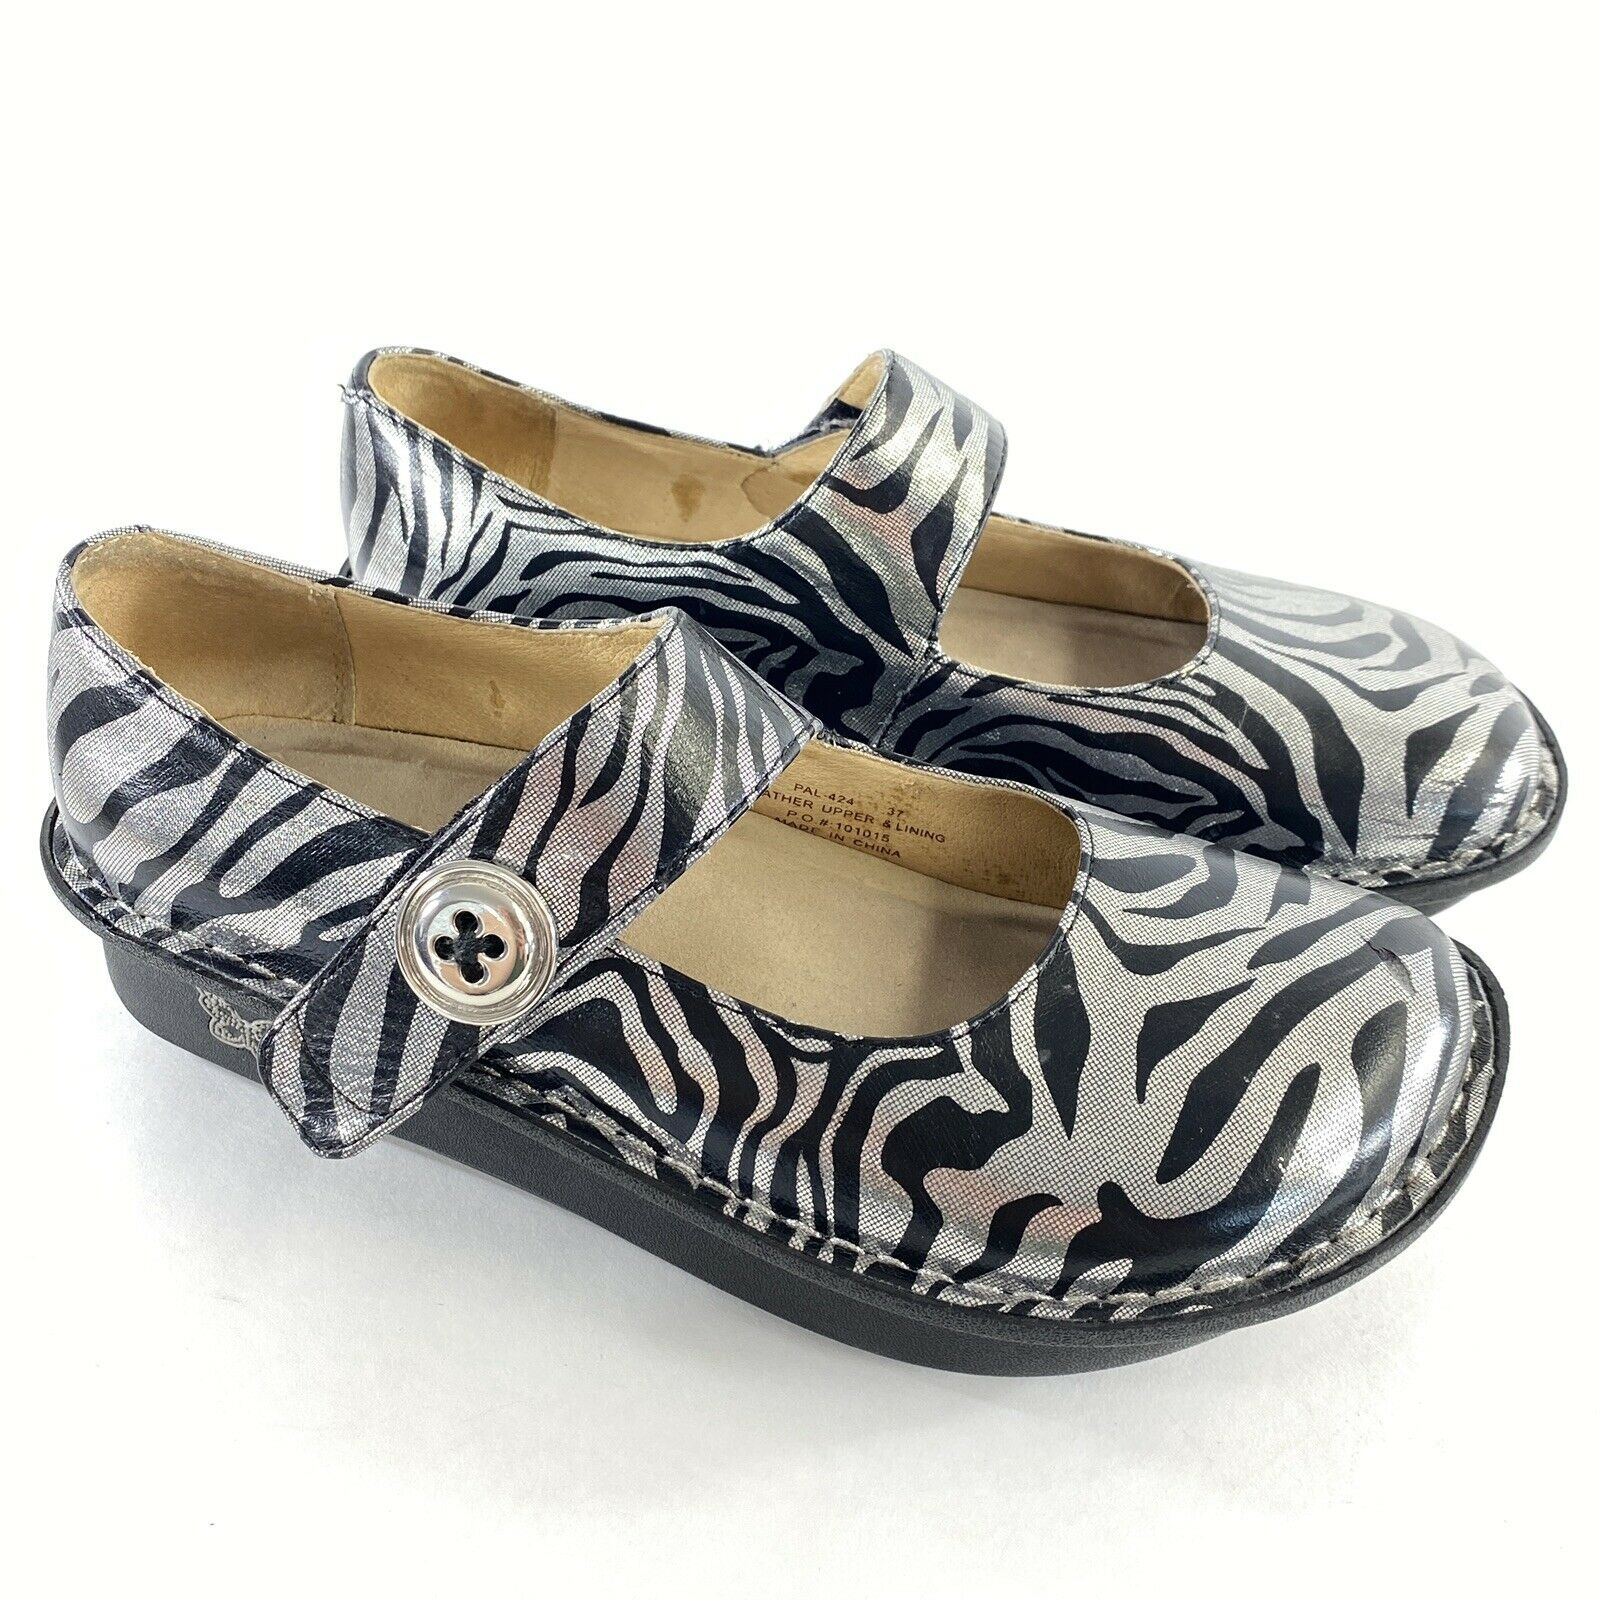 Alegria Shoe 37 US 7 Zebra Print Black Silver Metallic Leather Mary Jane comfort